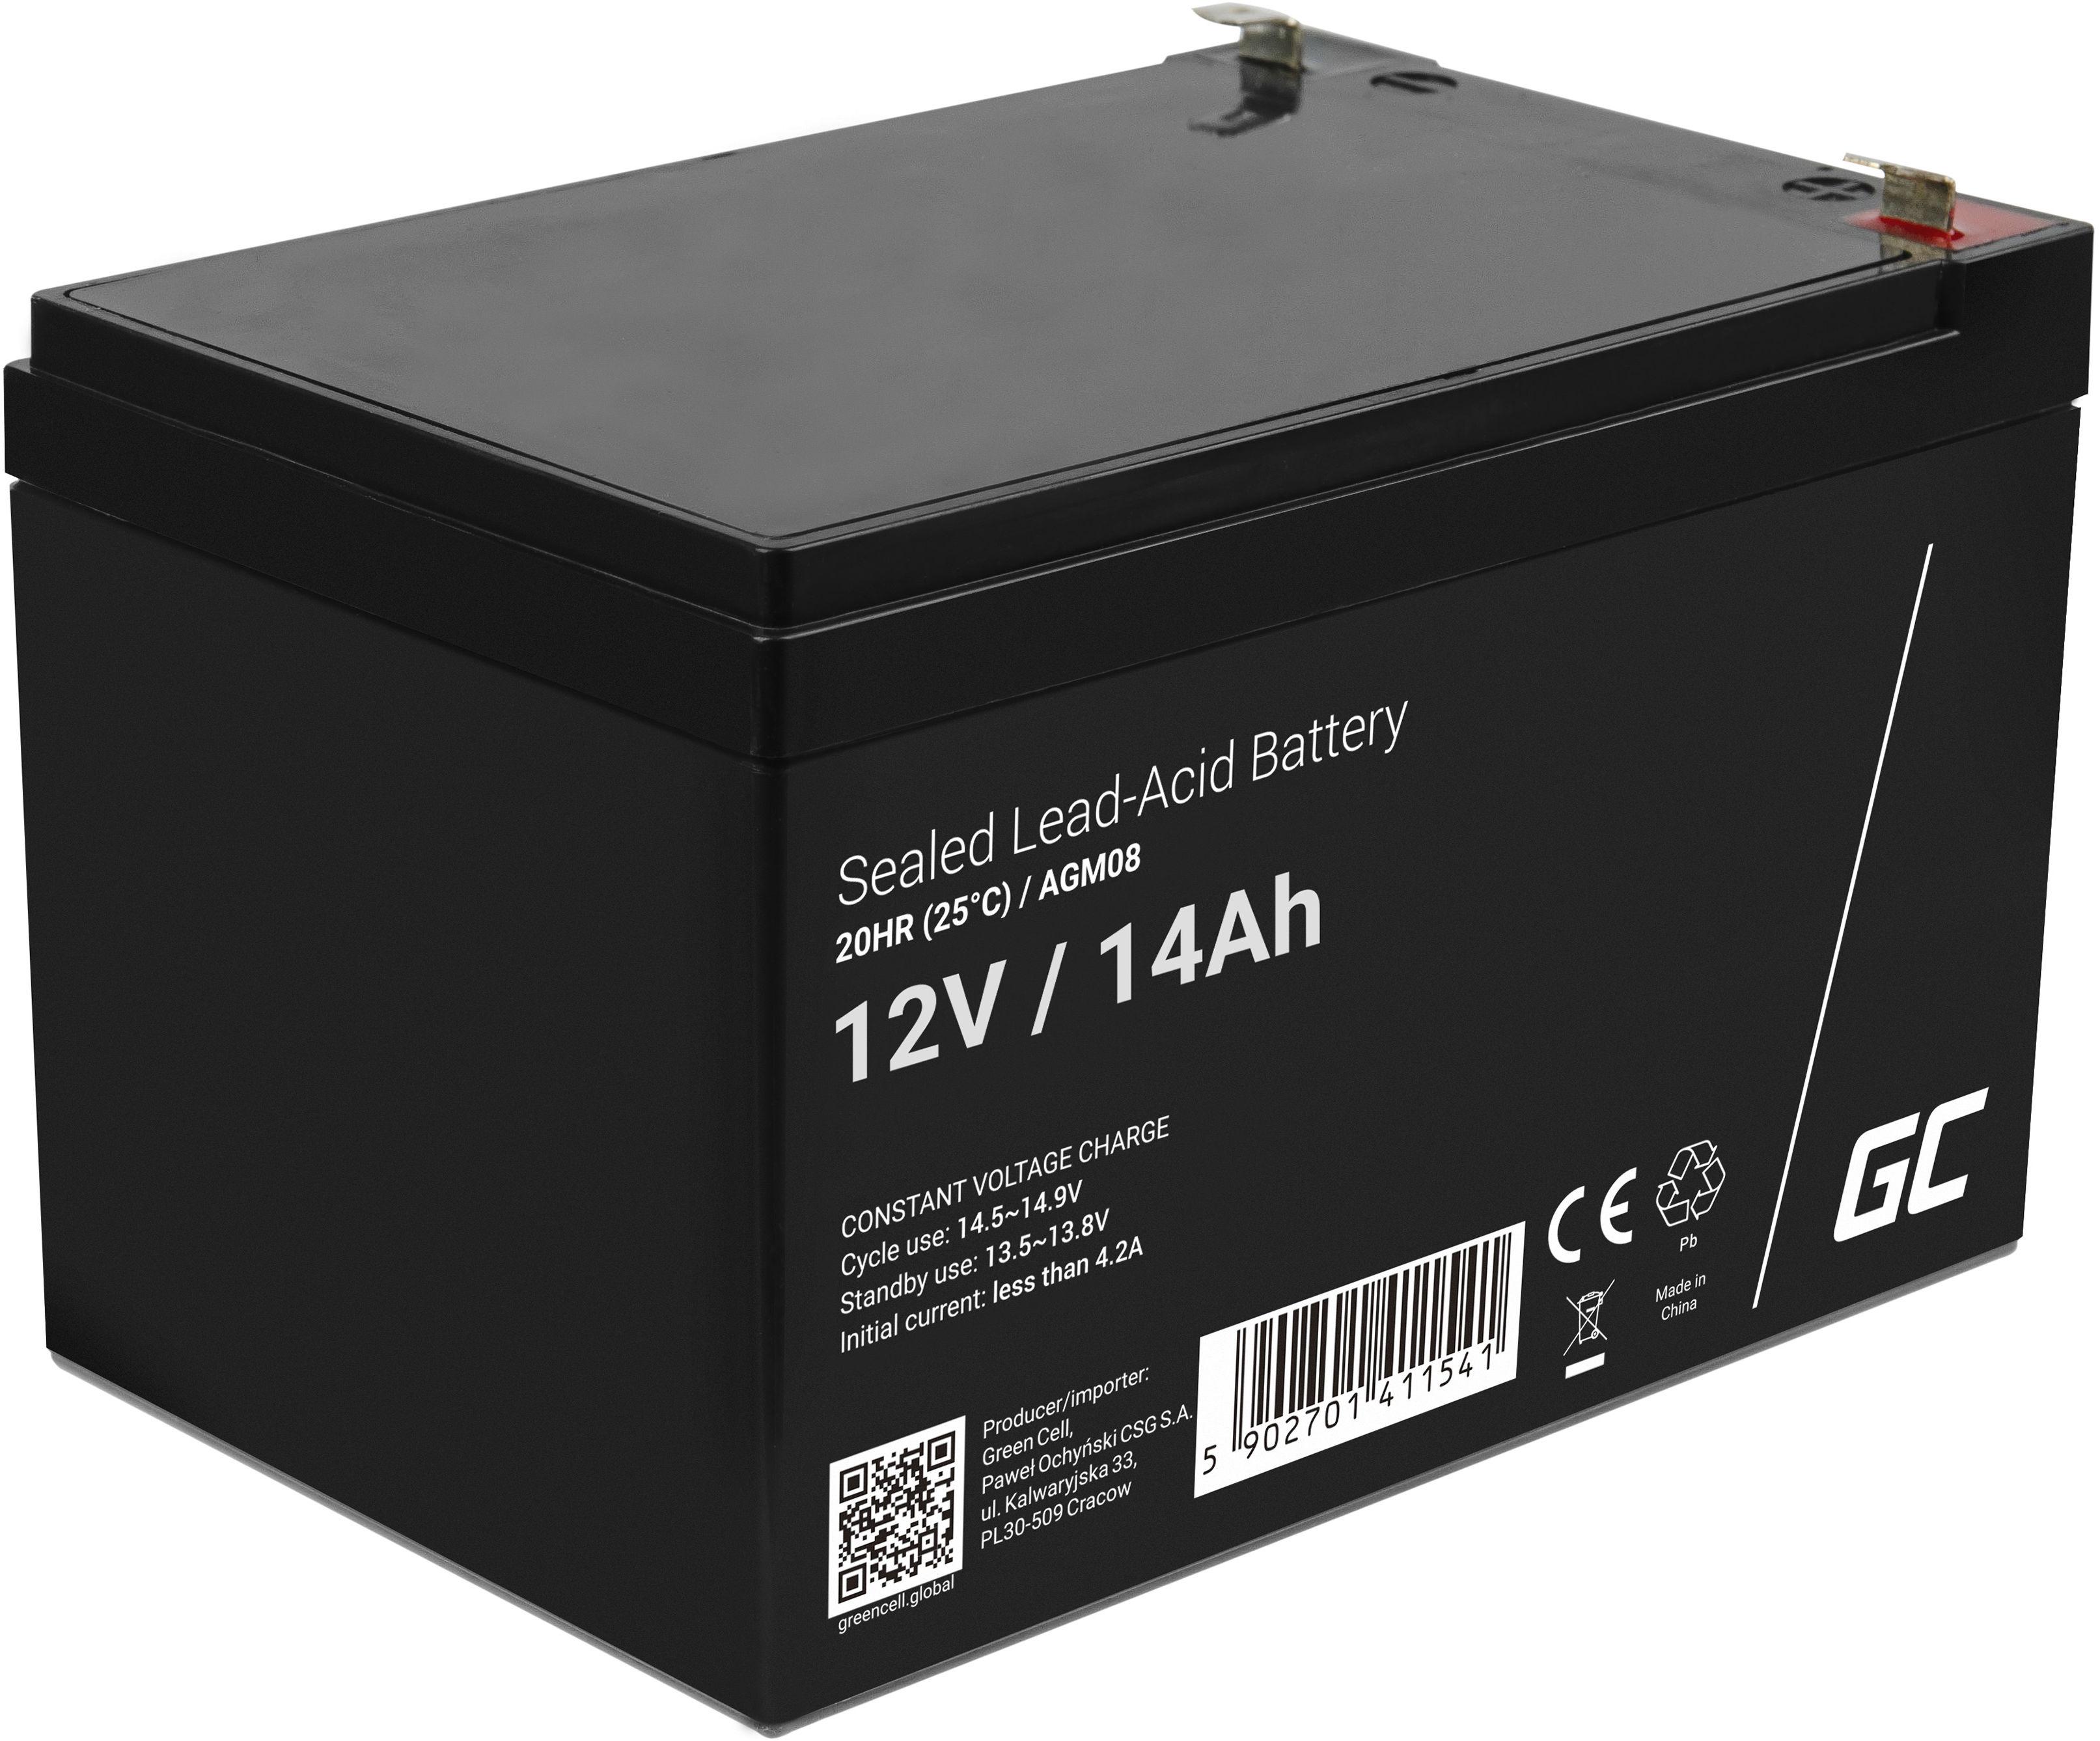 Green Cell AGM VRLA 12V 14Ah bezobsługowy akumulator do systemu alarmowego kasy fiskalnej zabawki